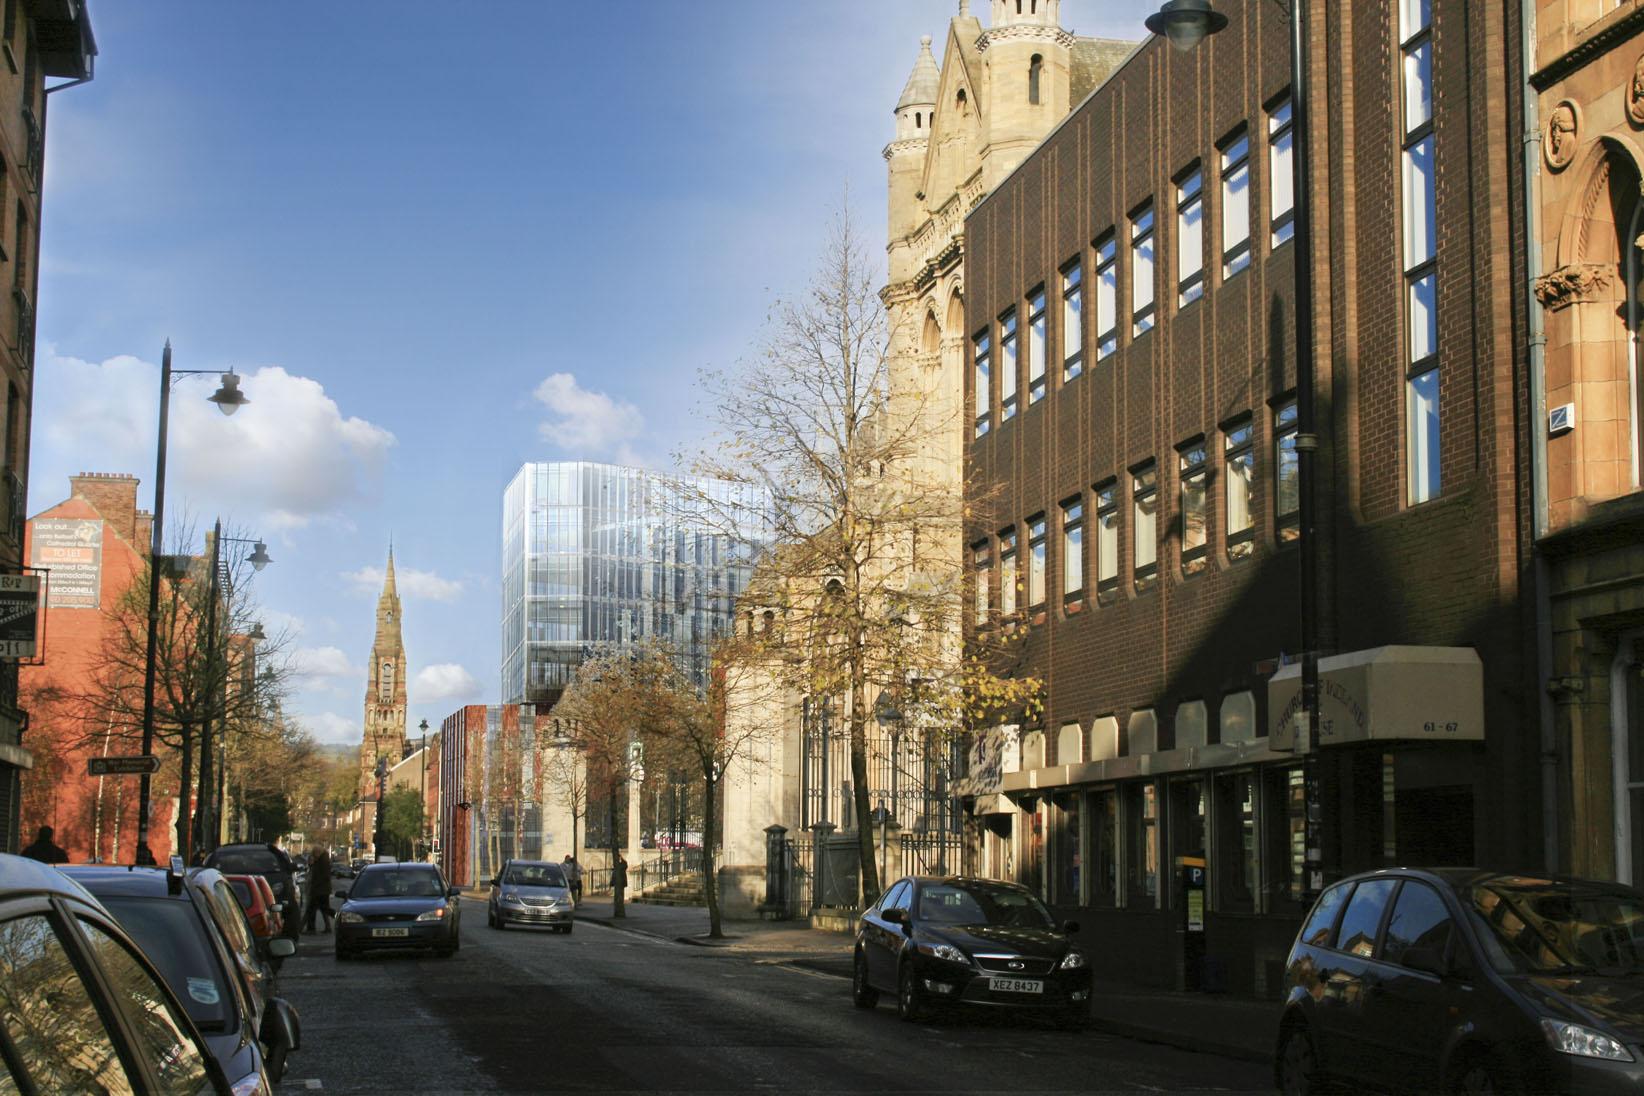 Find part time jobs belfast city centre now. We have 22 ads from 53 sites for part time jobs belfast city centre, under part-time jobs in Part-time jobs.